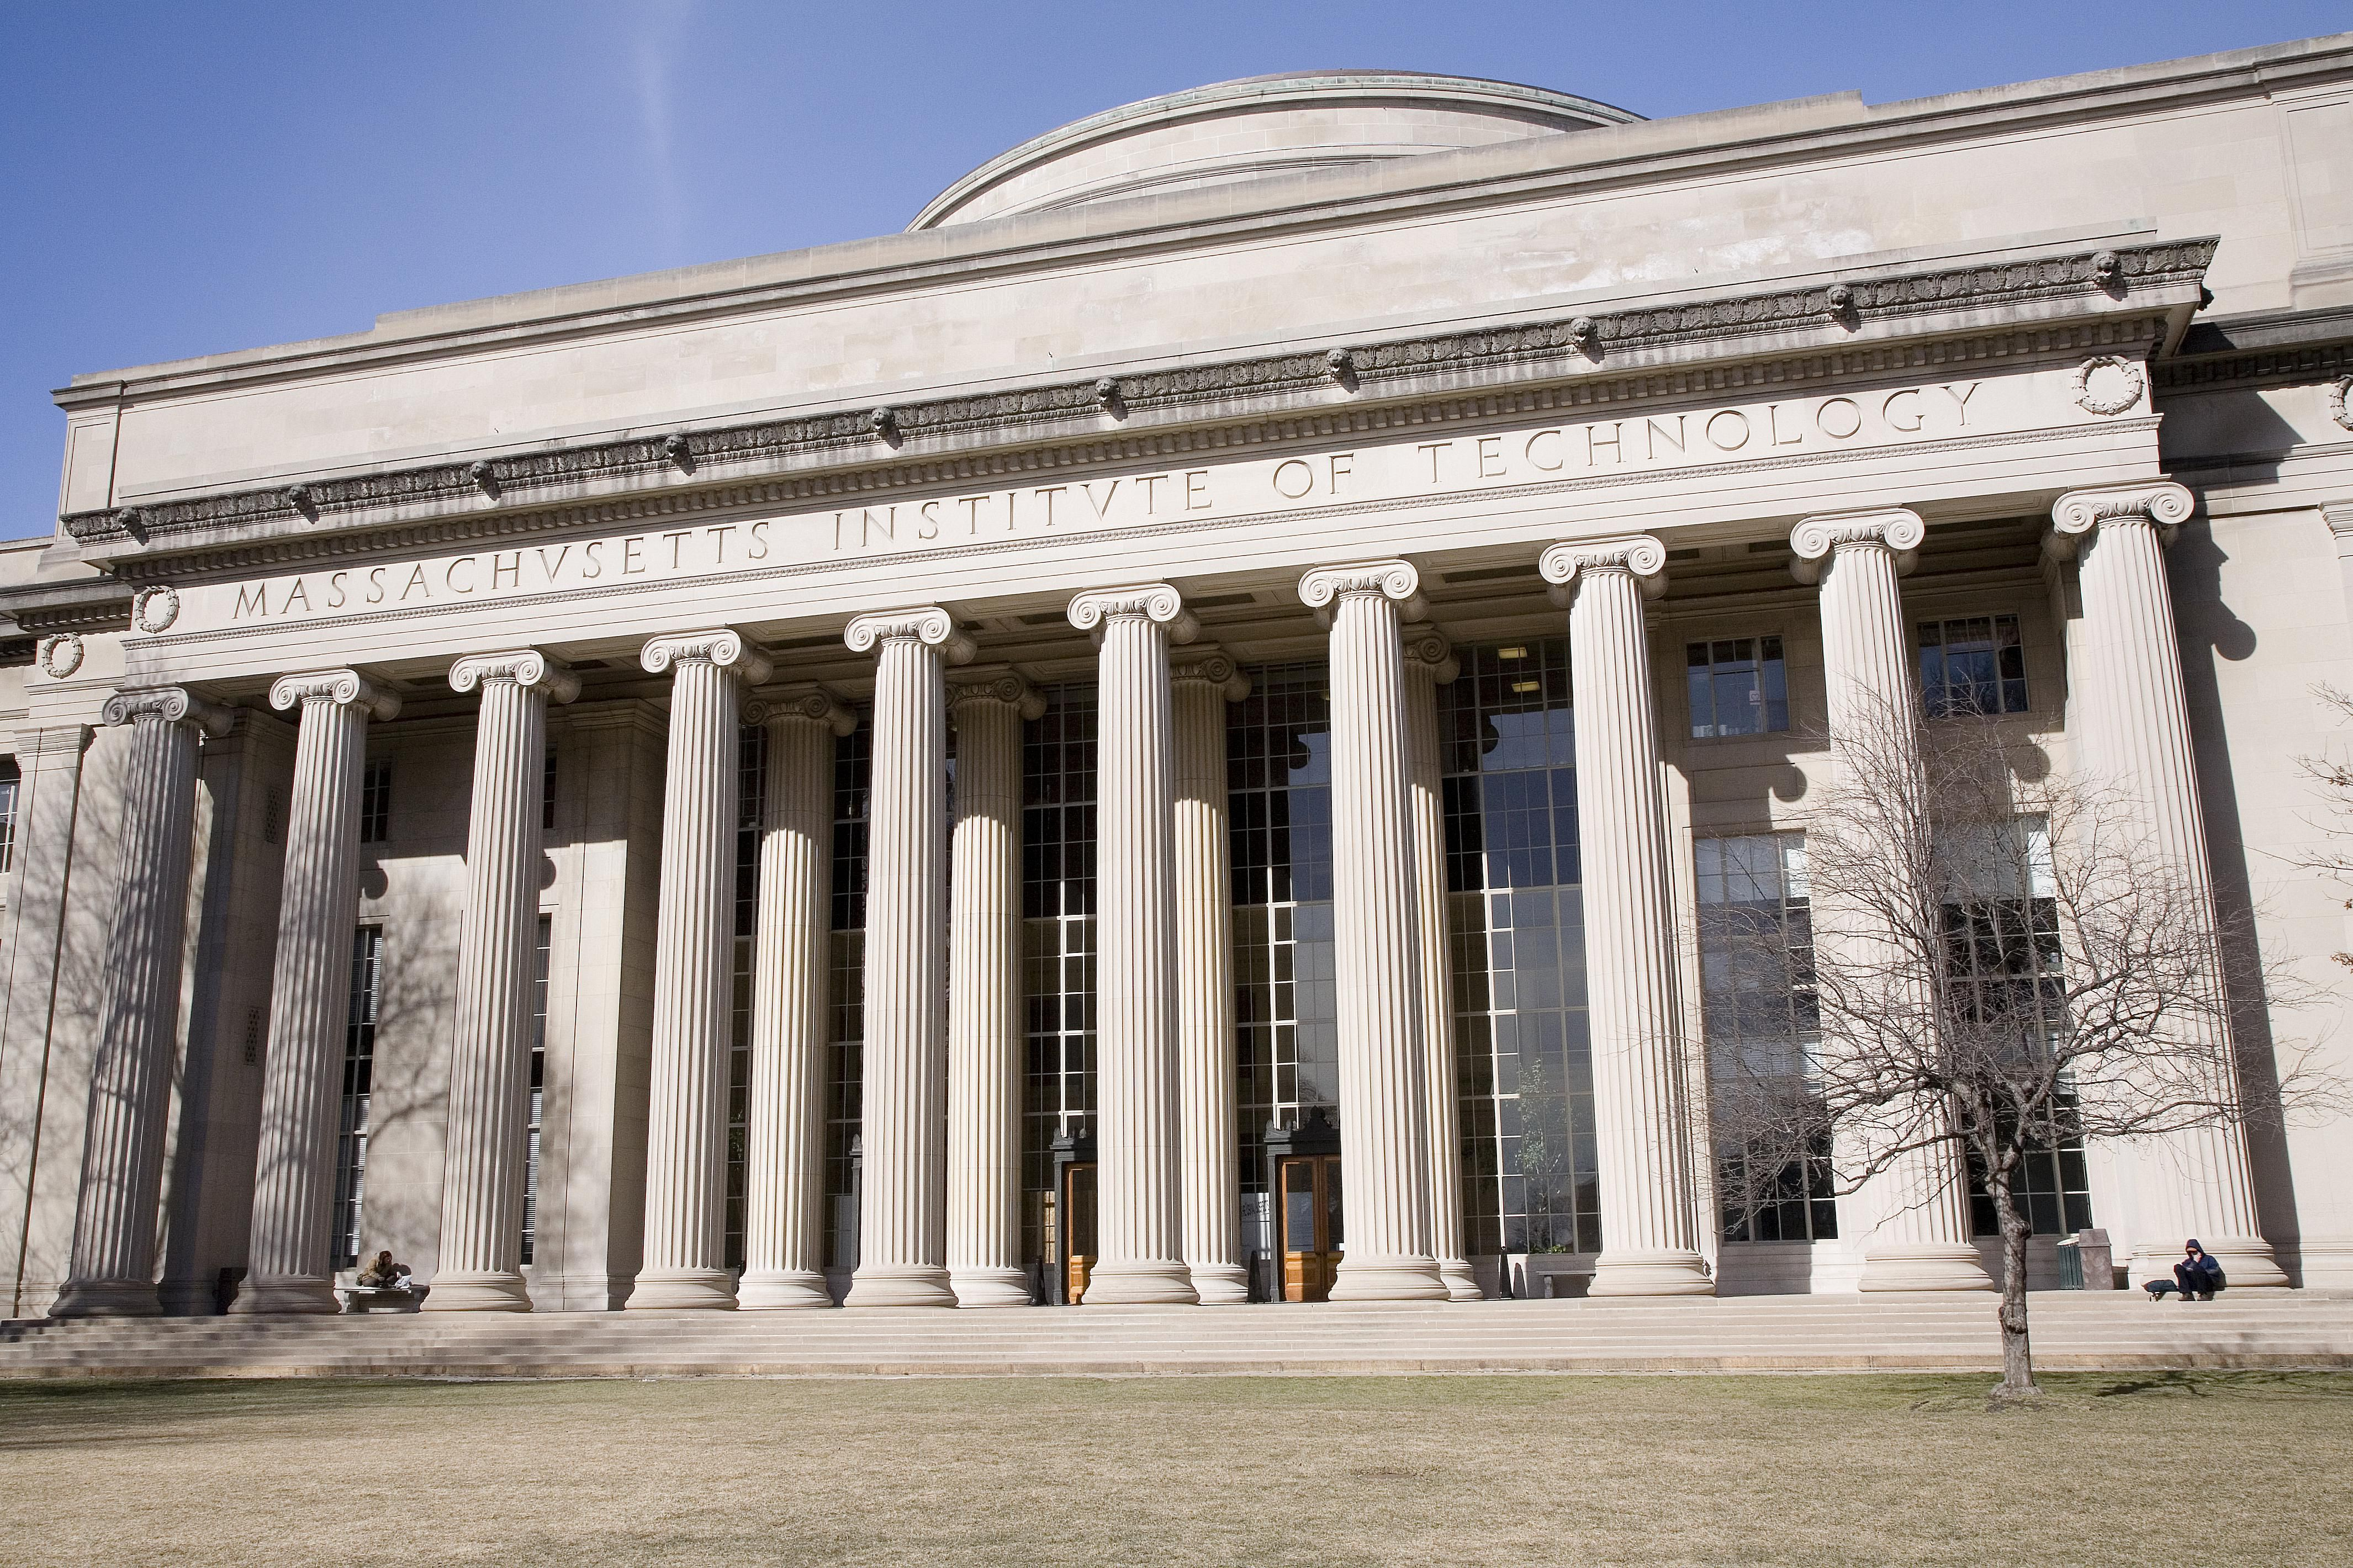 Massachusets Institute of Technology (MIT) Campus Building